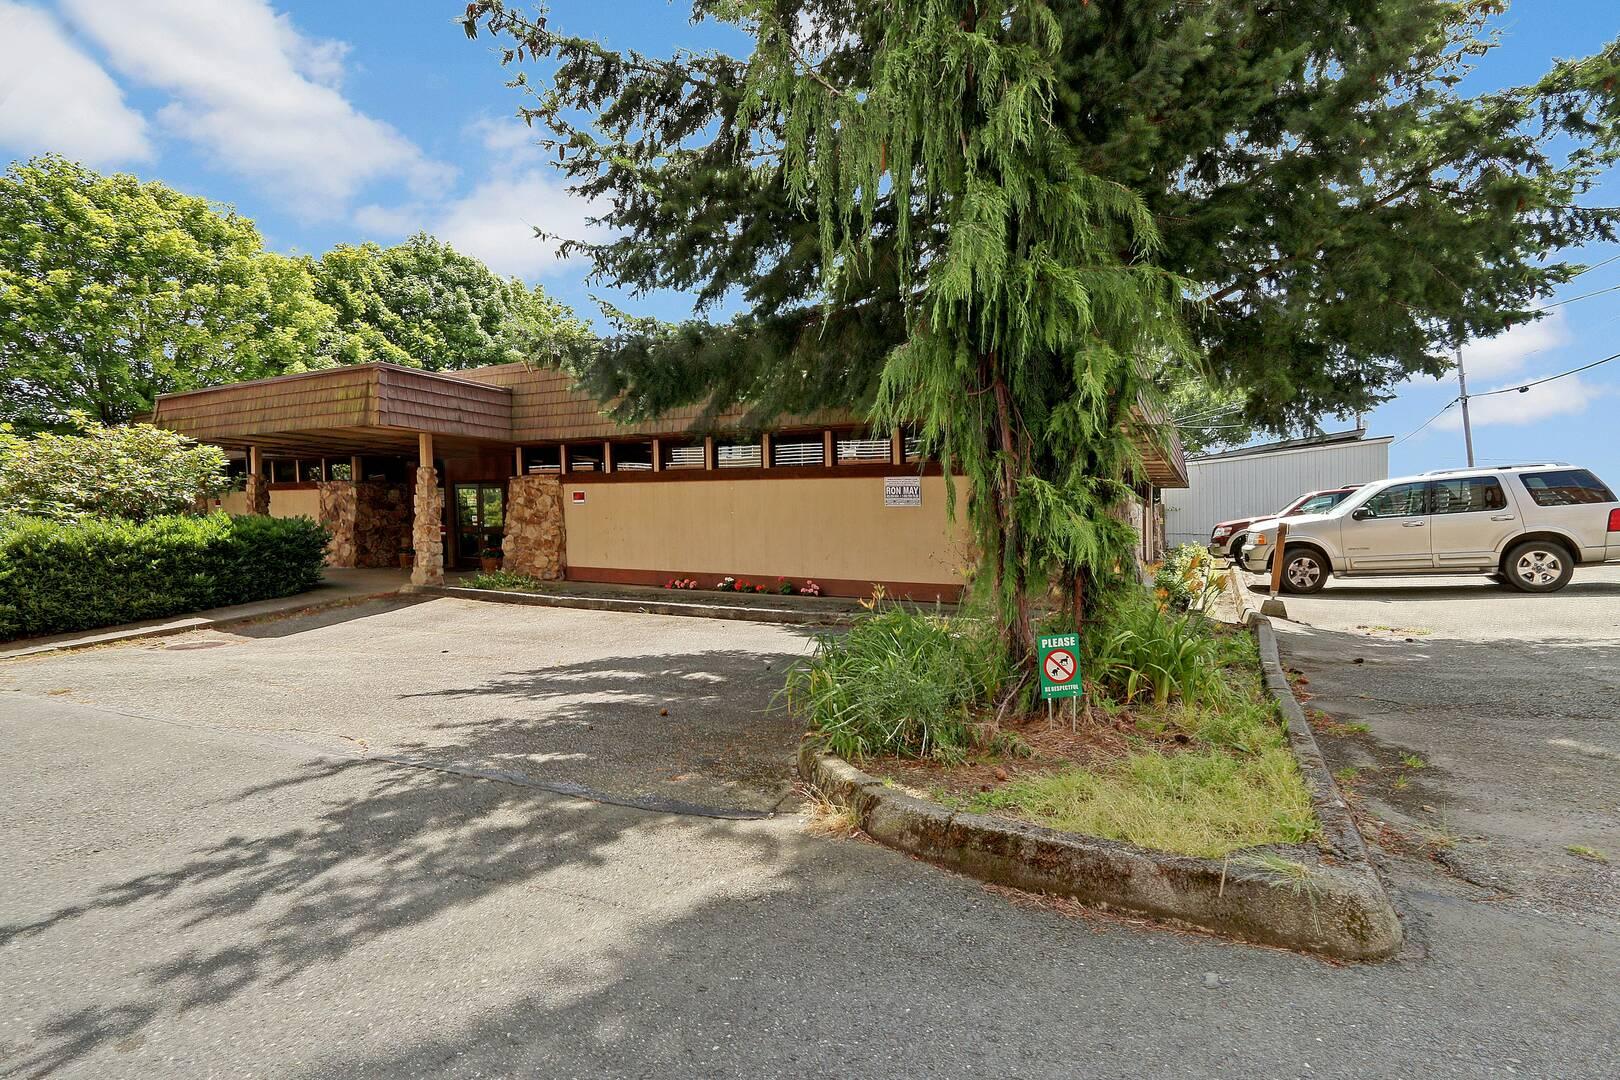 3114 Oakes Ave Everett, WA 98201